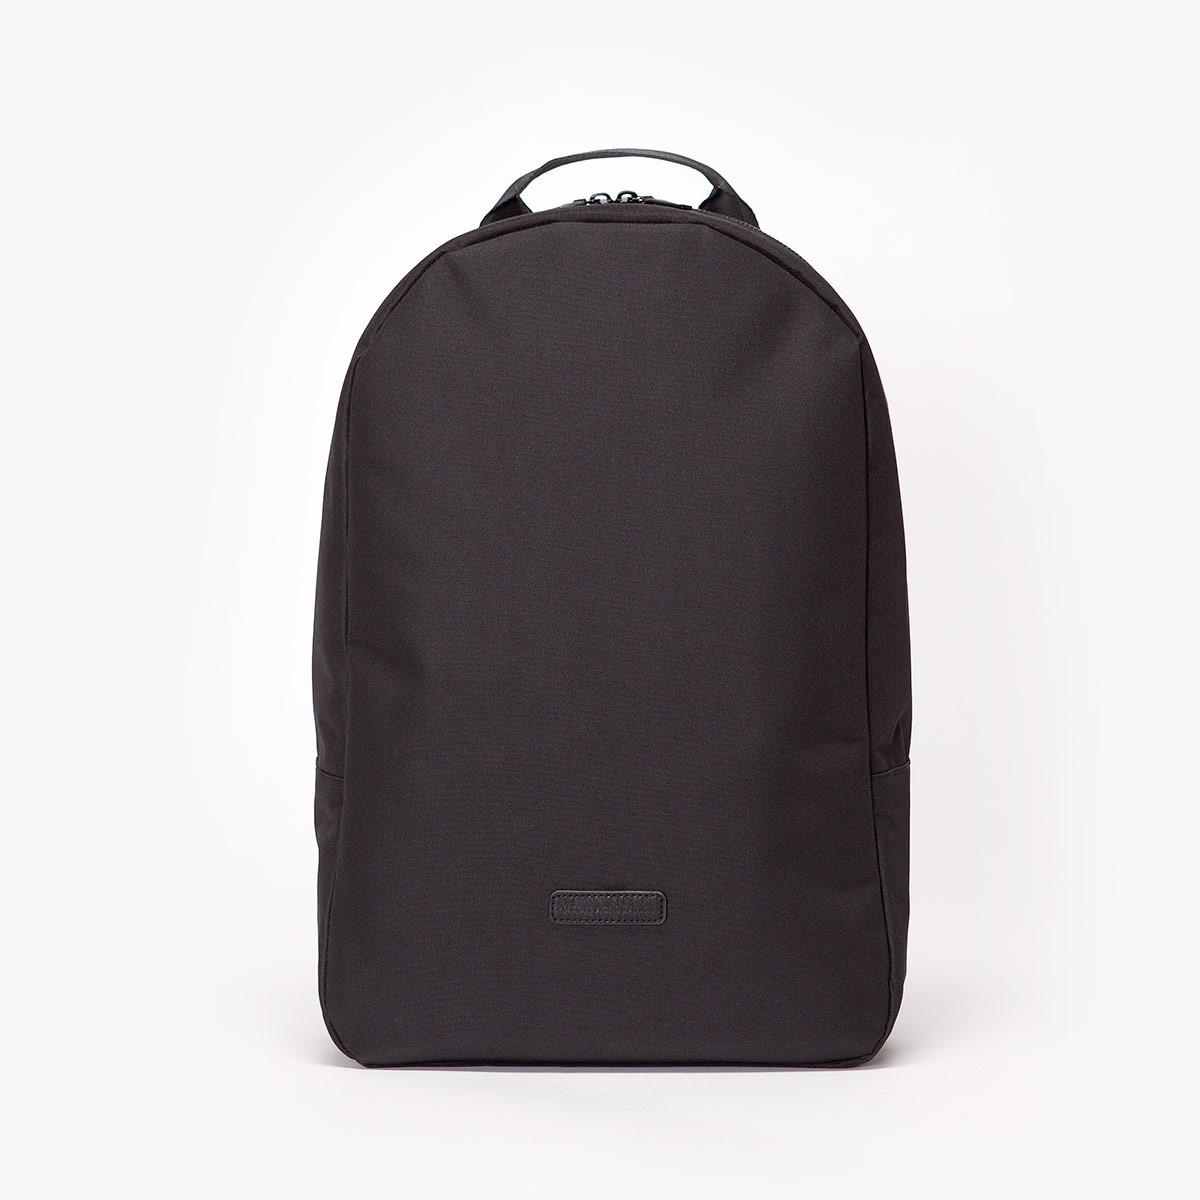 ua_marvin-backpack_stealth-series_black_01.jpg